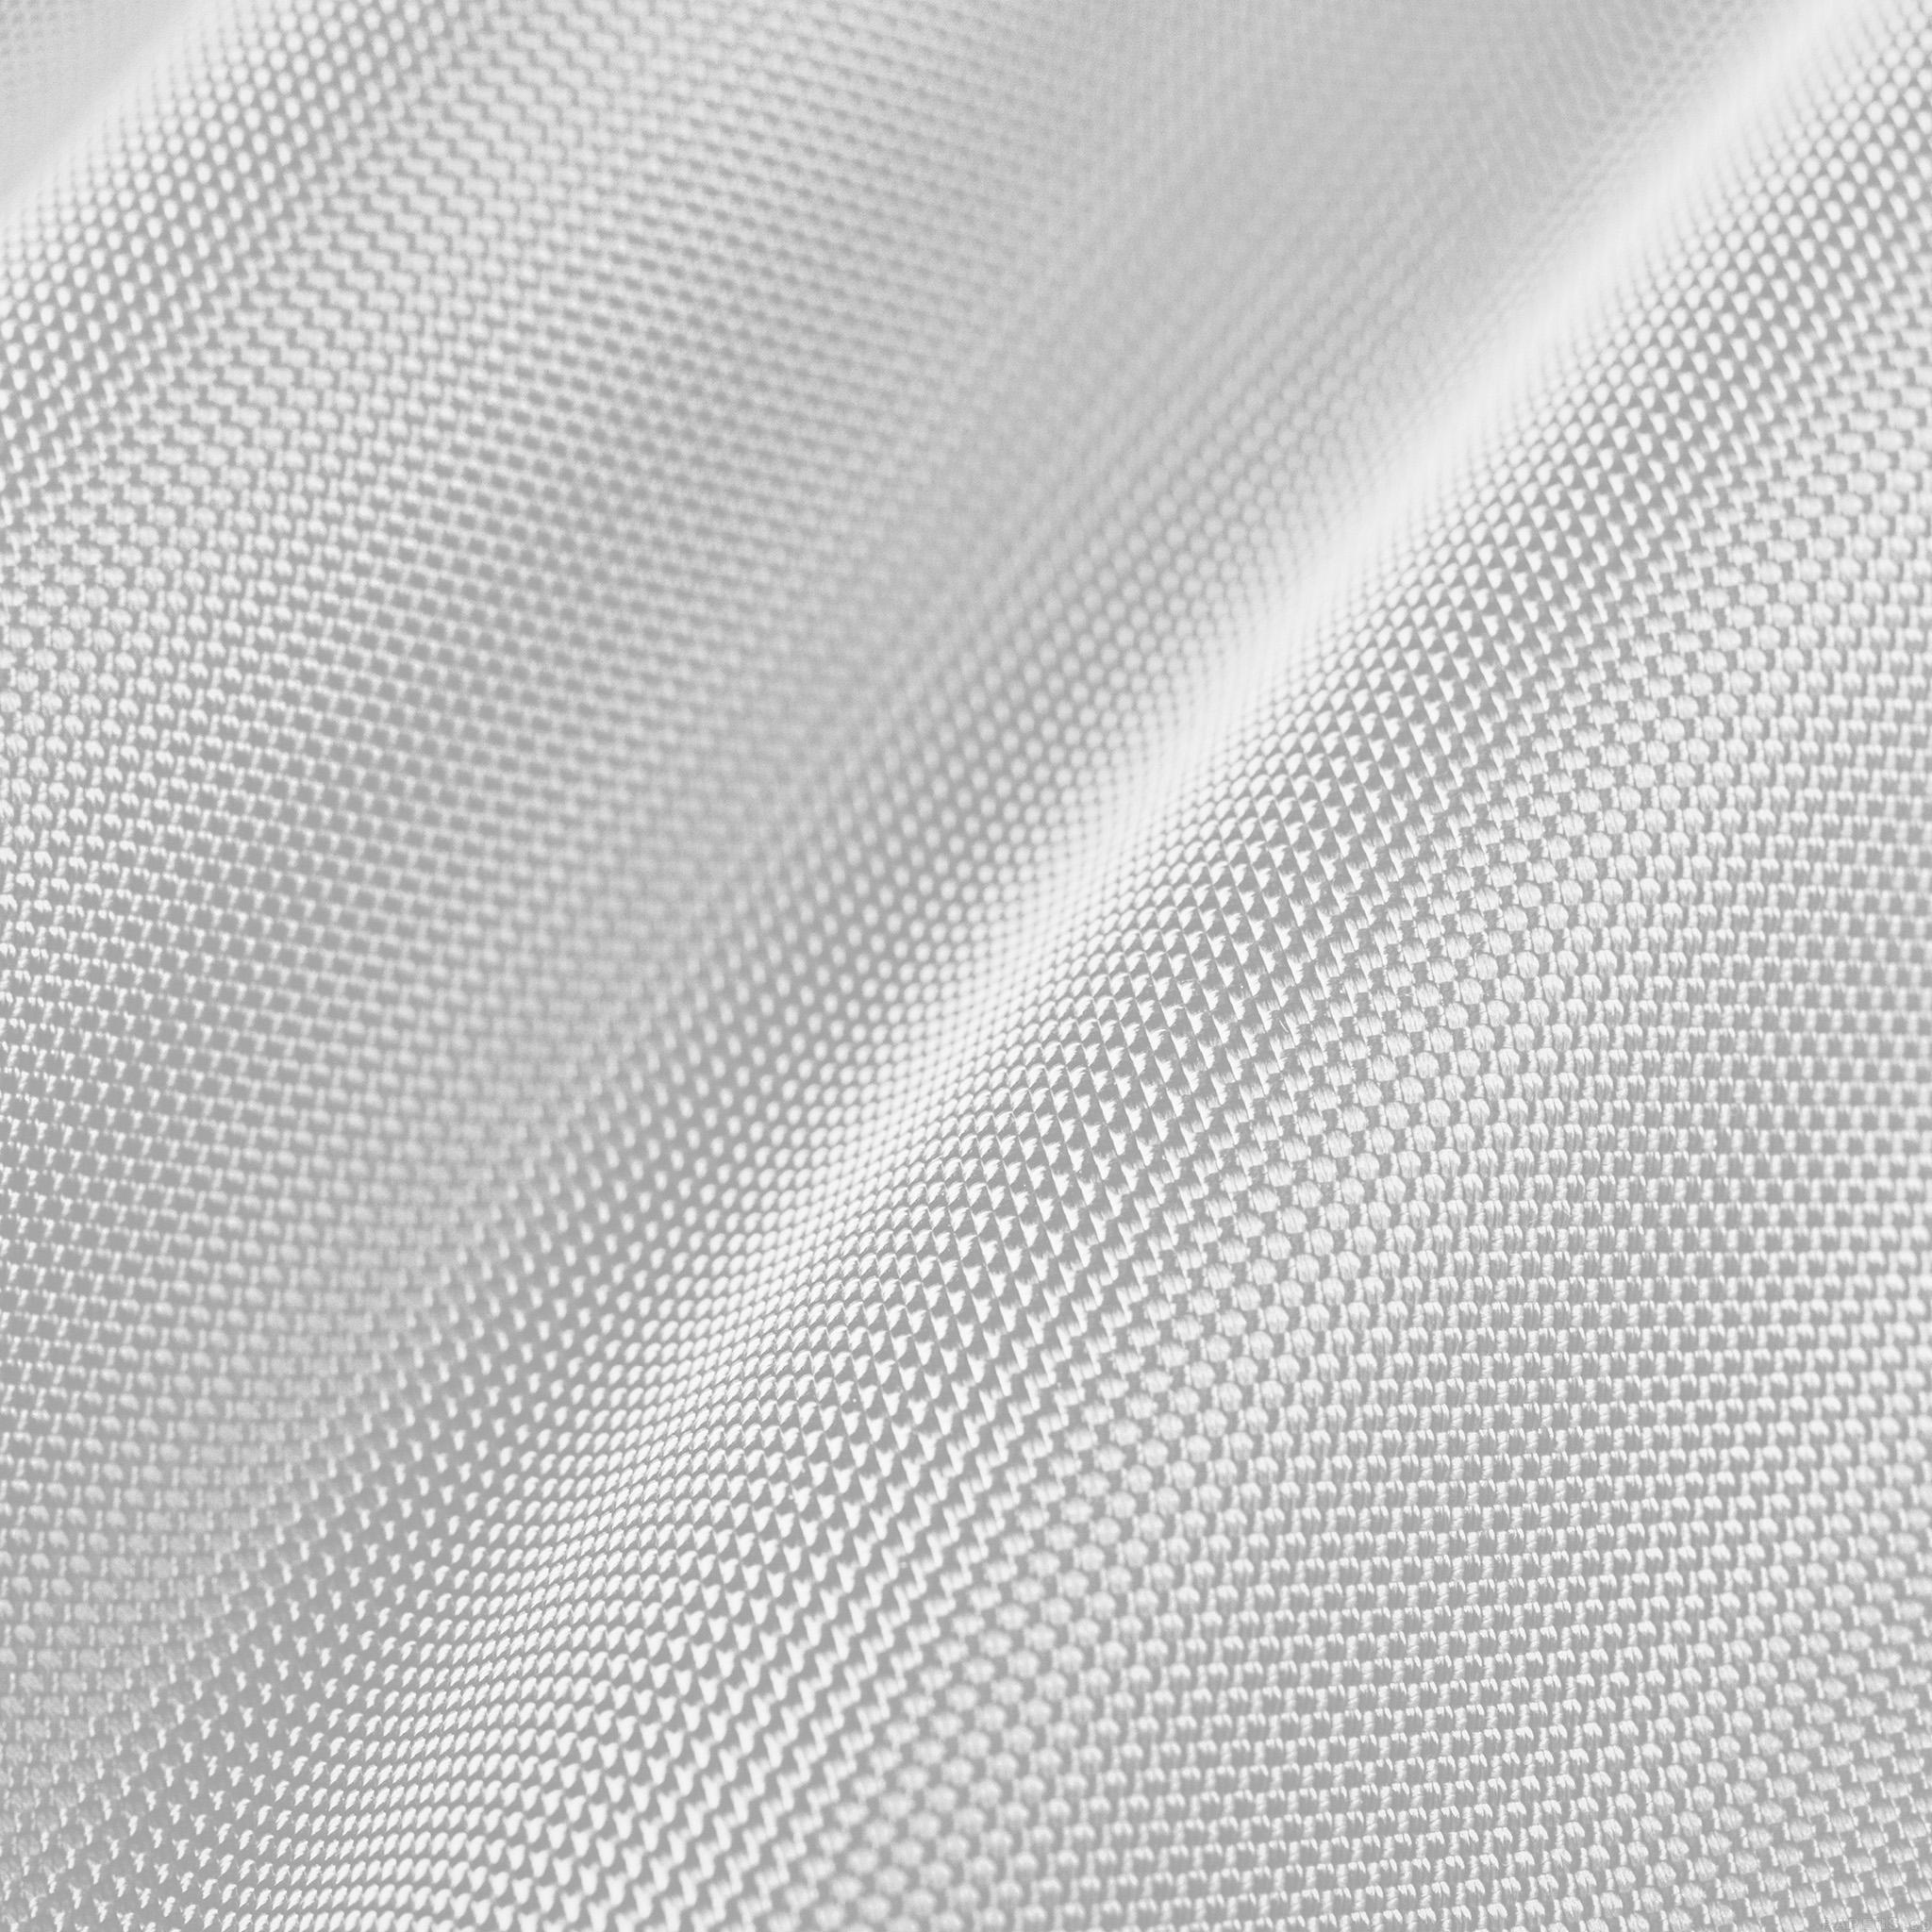 Vh75 tri nylon white android texture samsung pattern wallpaper ipad retina voltagebd Choice Image